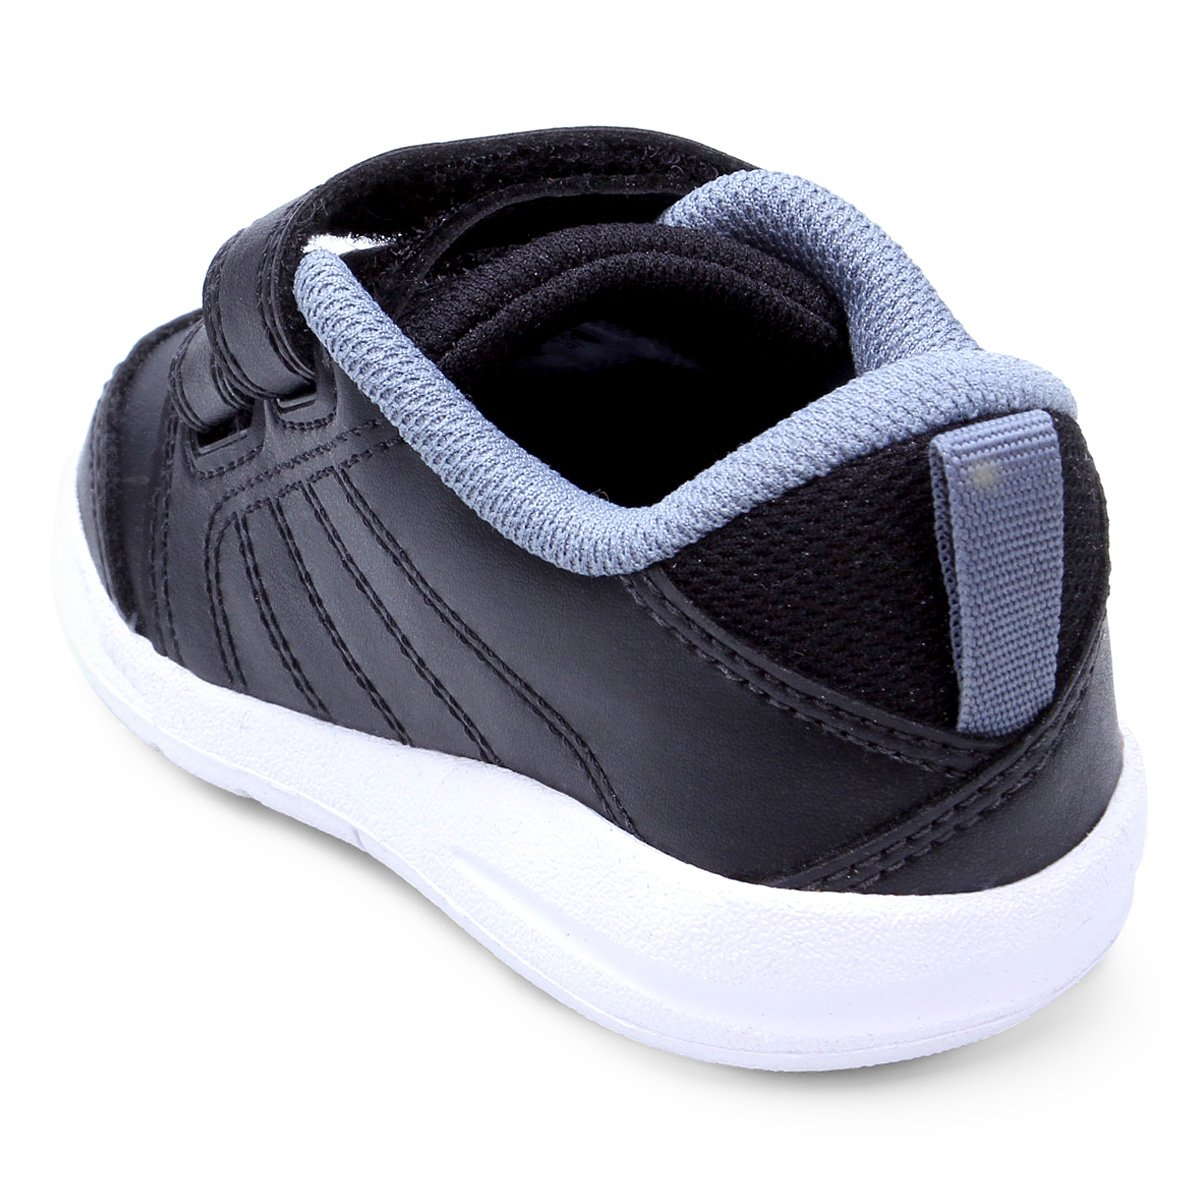 Tênis Infantil Nike Pico Lt Masculino - Tam: 21 - 1